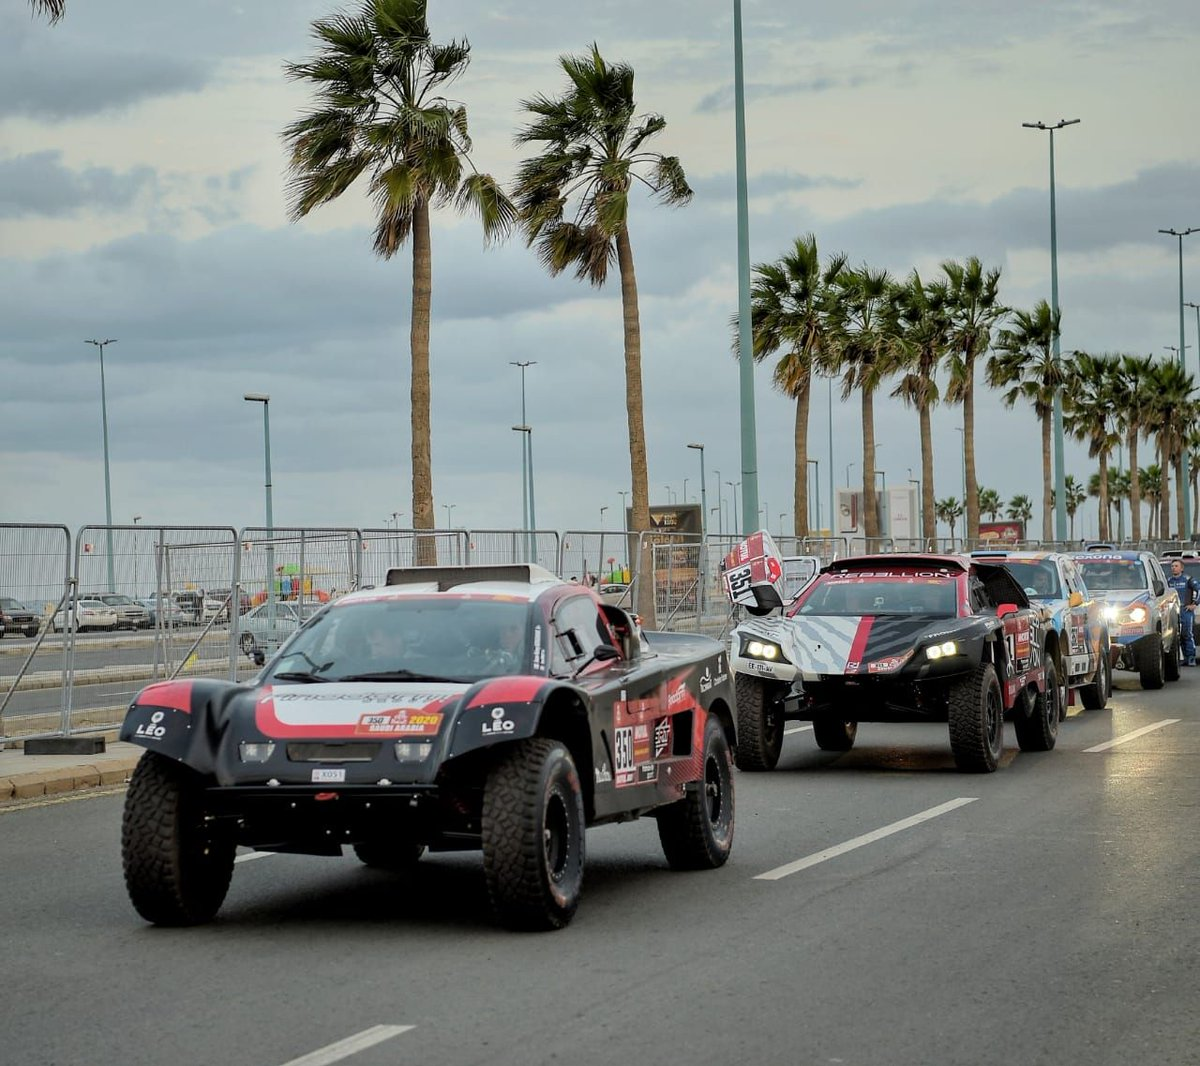 2020 42º Rallye Raid Dakar - Arabia Saudí [5-17 Enero] - Página 3 ENgtEMmXsAARyH_